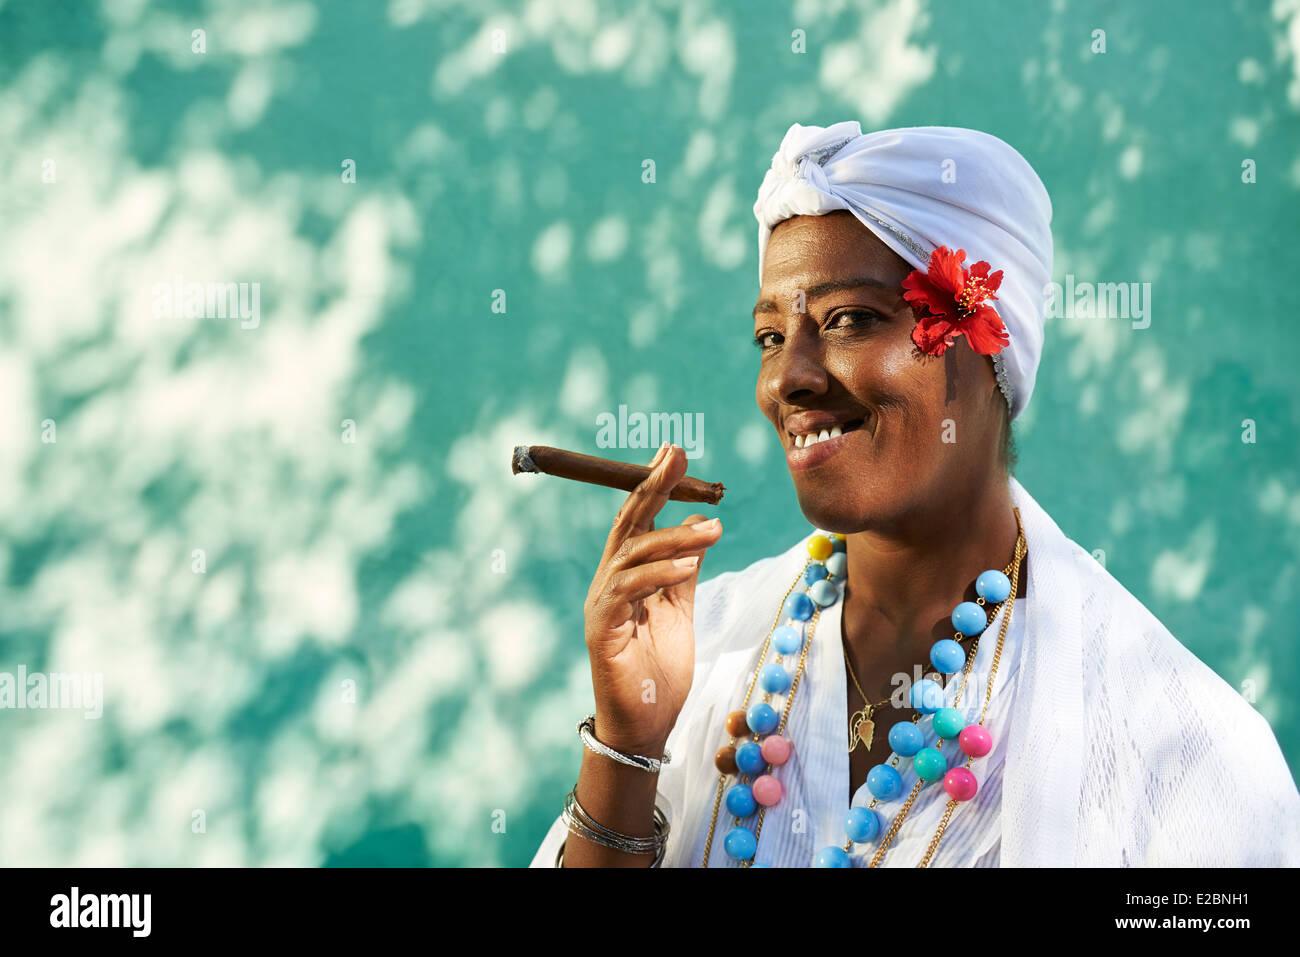 Portrait of african cuban woman smoking cohiba cigar and looking at camera smiling - Stock Image